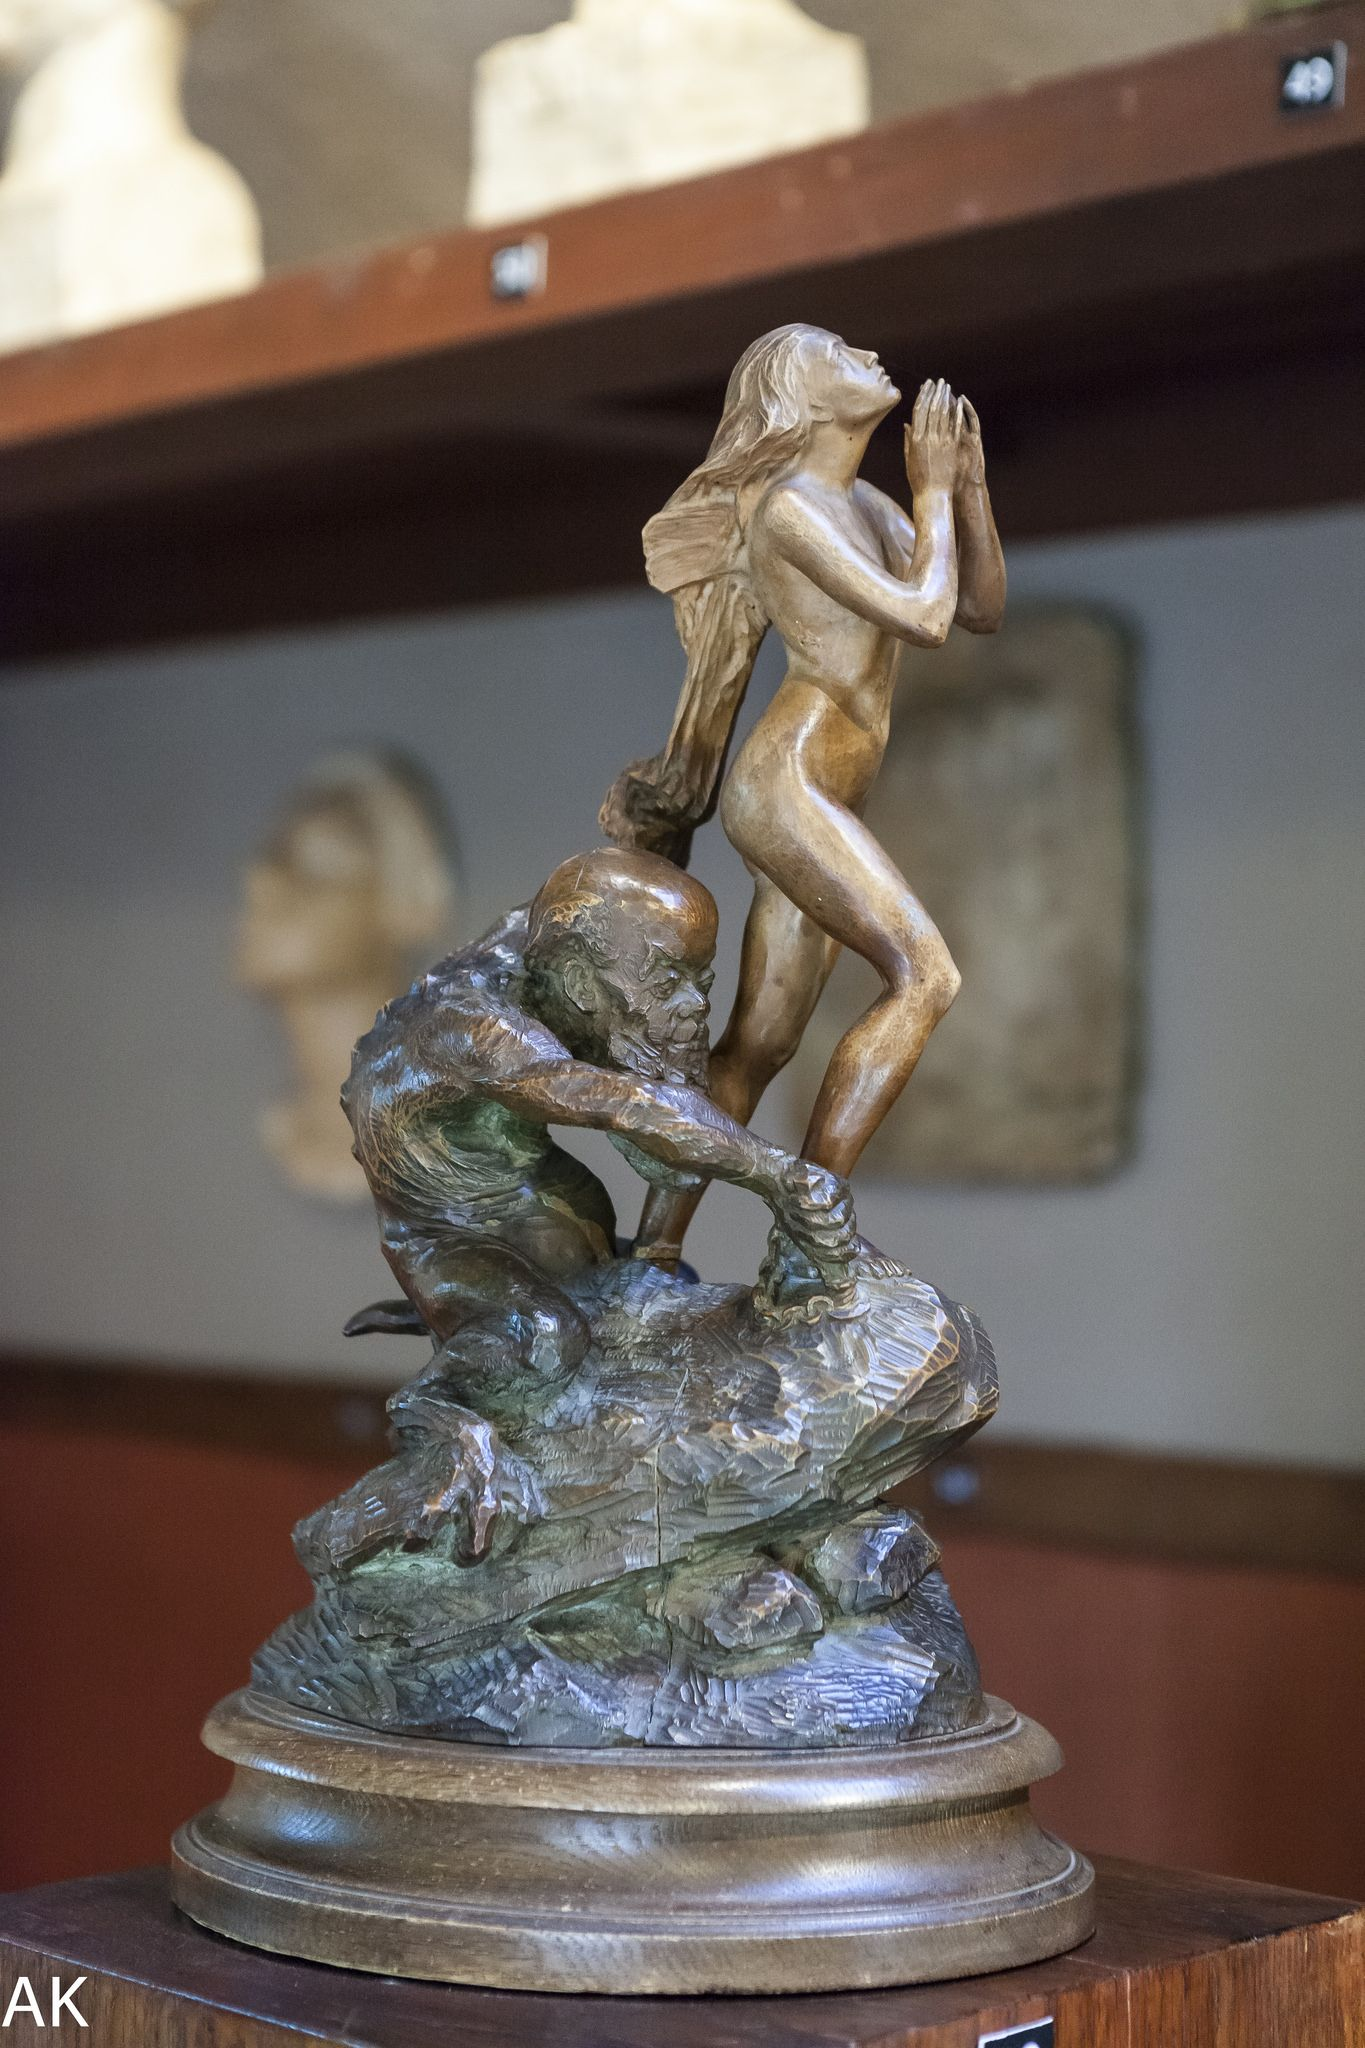 Ajanjumalan vanki (Vaan päästä meidät pahasta) 1897  Sculpture by Emil Wikström / Emil Wikströmin veistos, Museo Visavuori